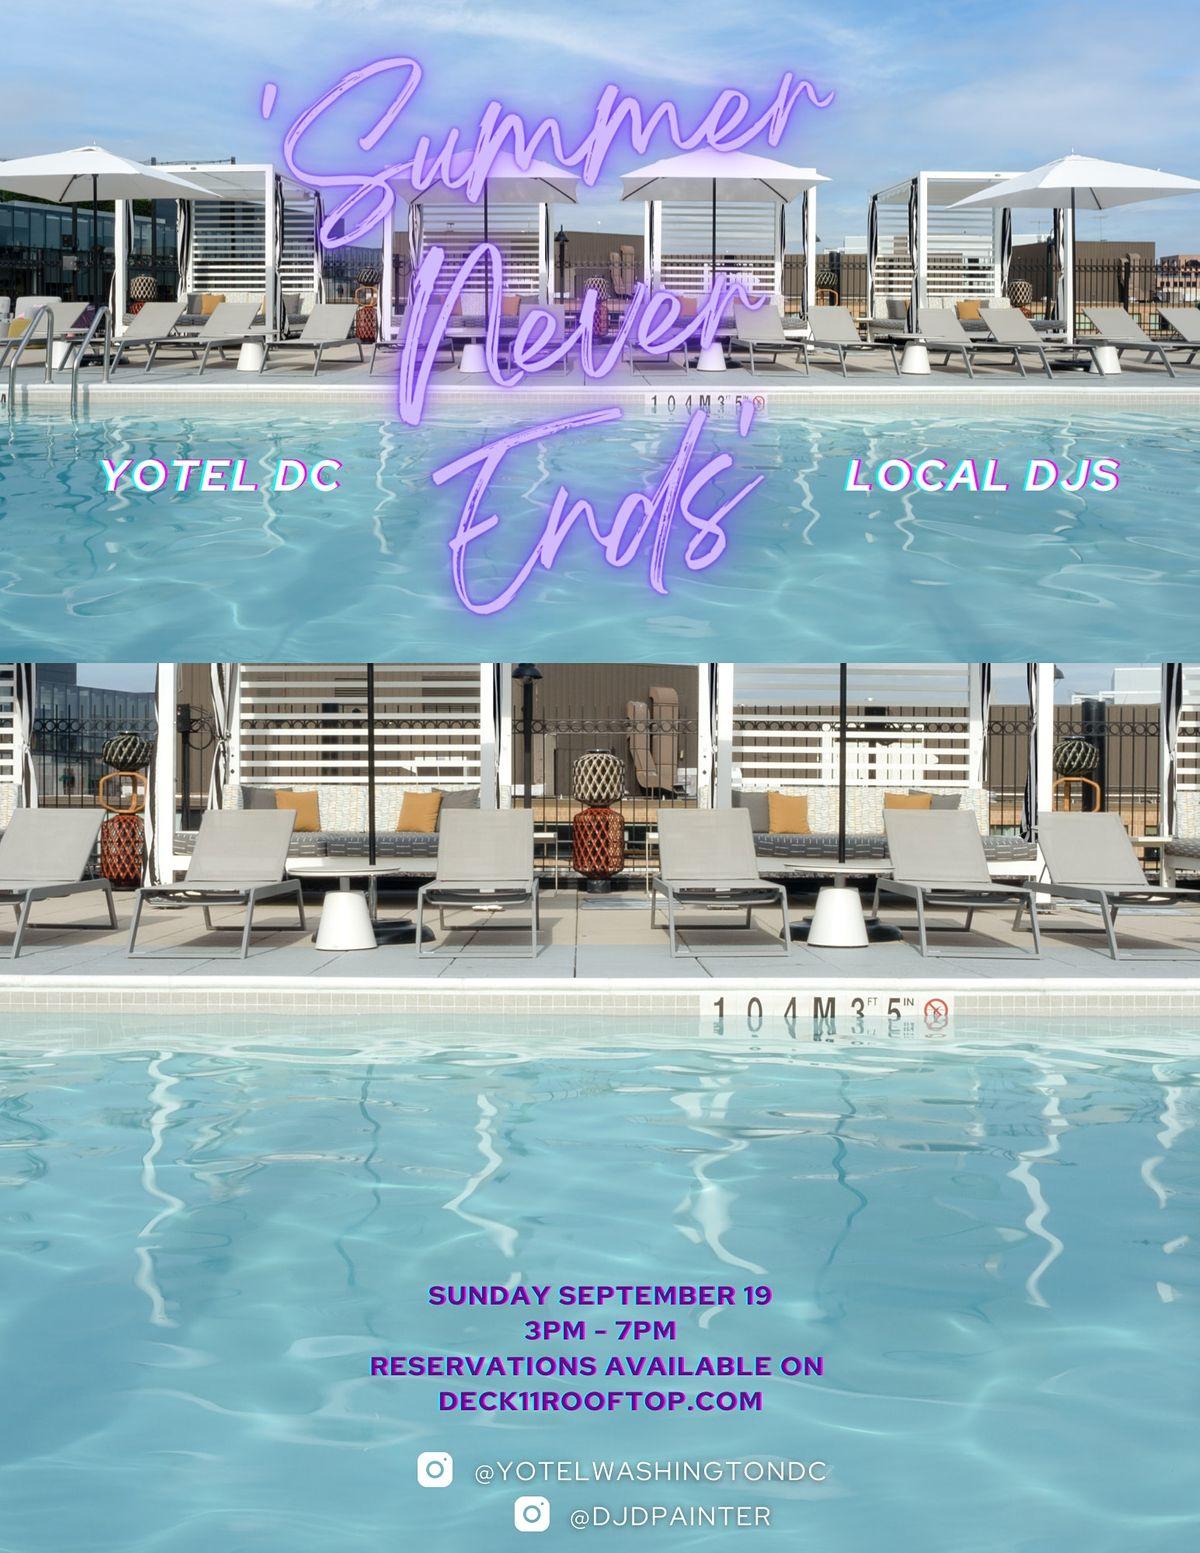 'Summer Never Ends' @ YOTEL's Deck`11